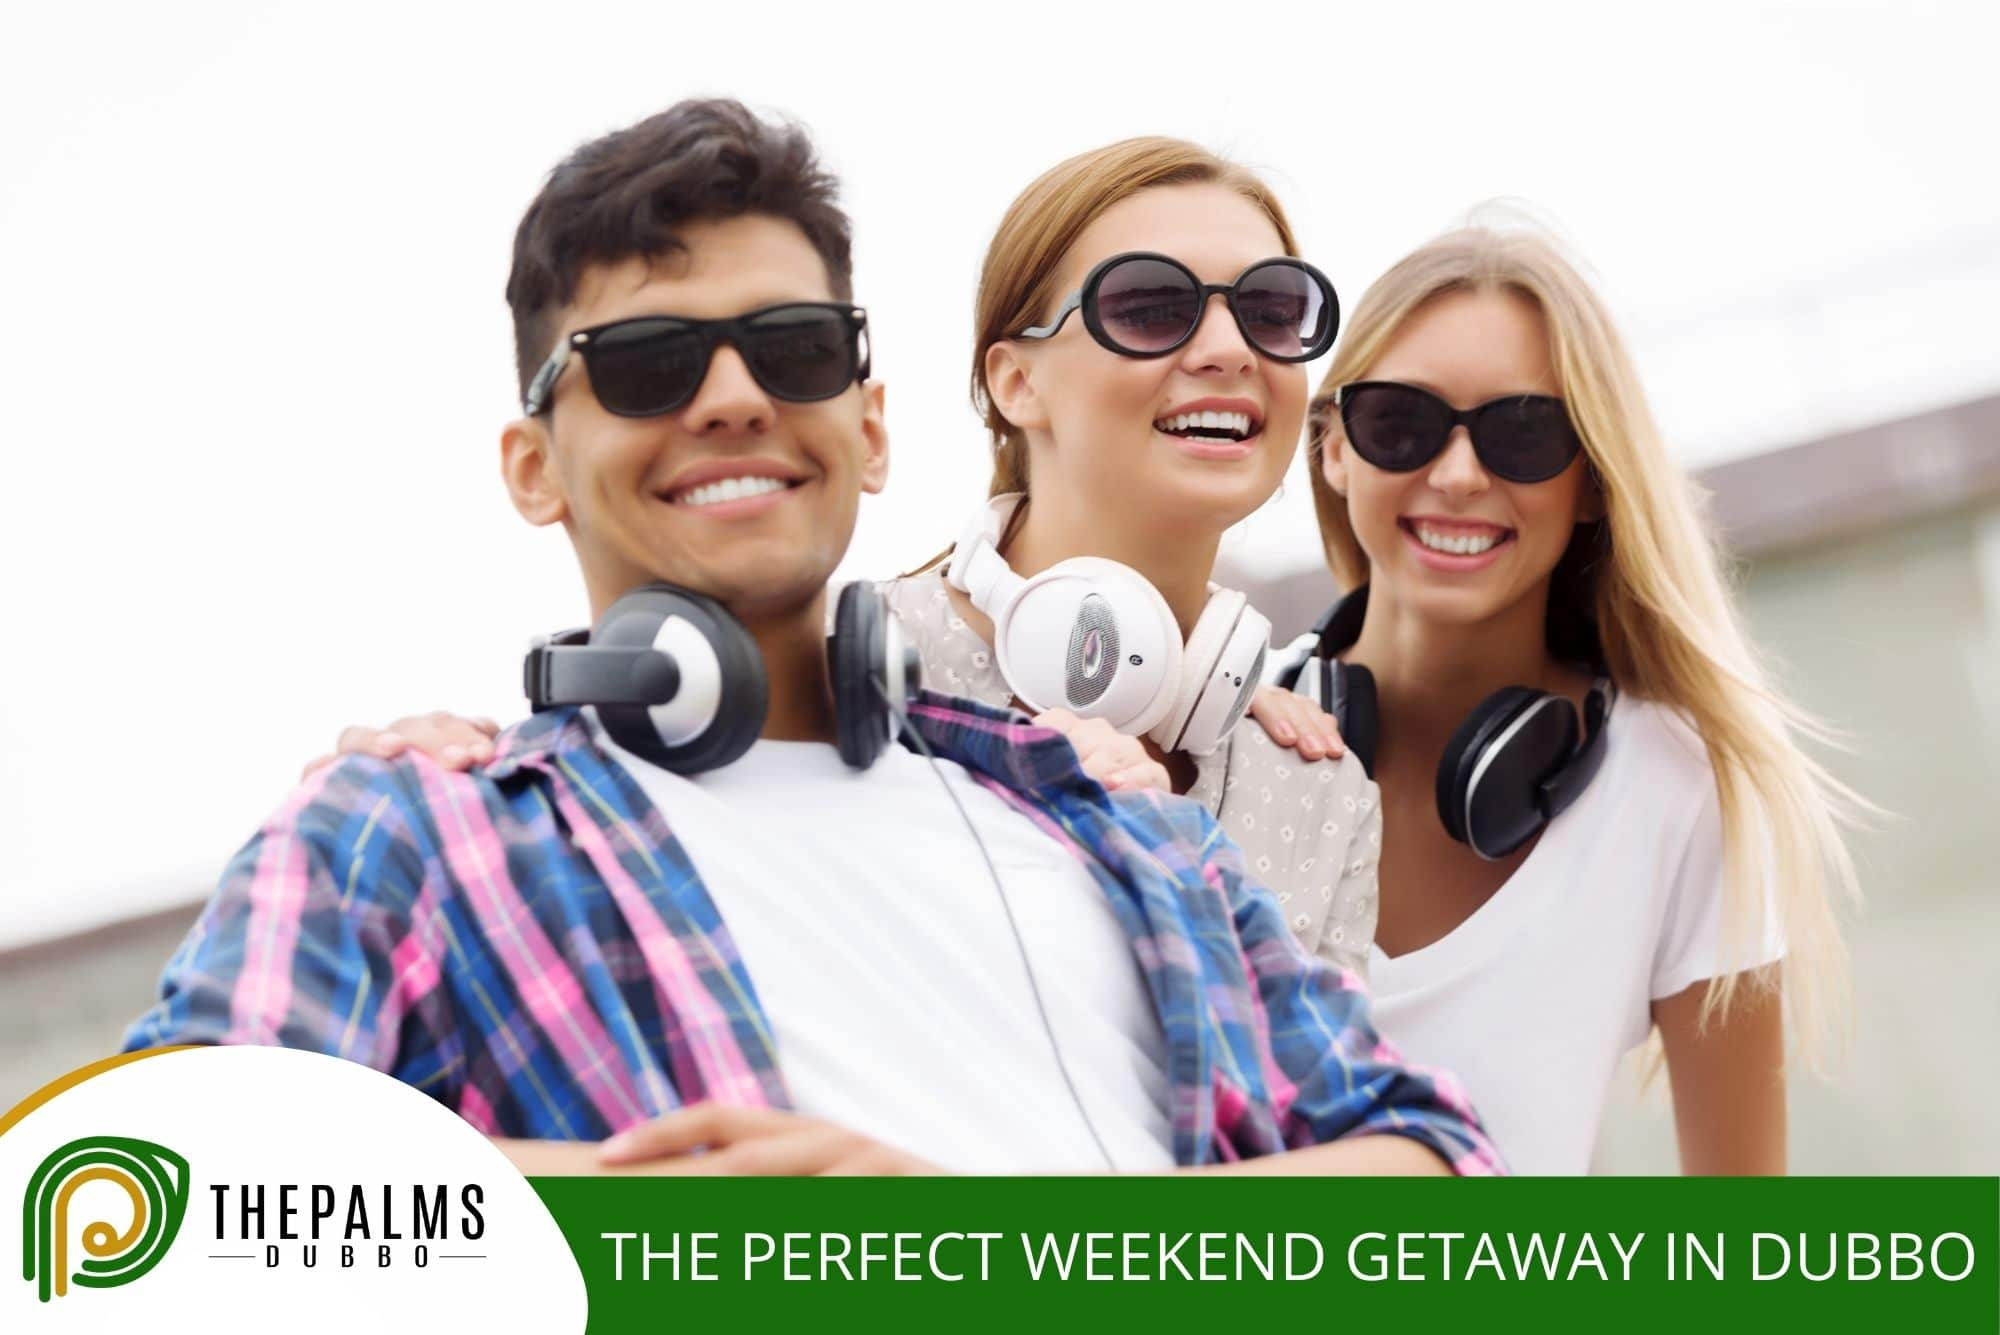 The Perfect Weekend Getaway in Dubbo